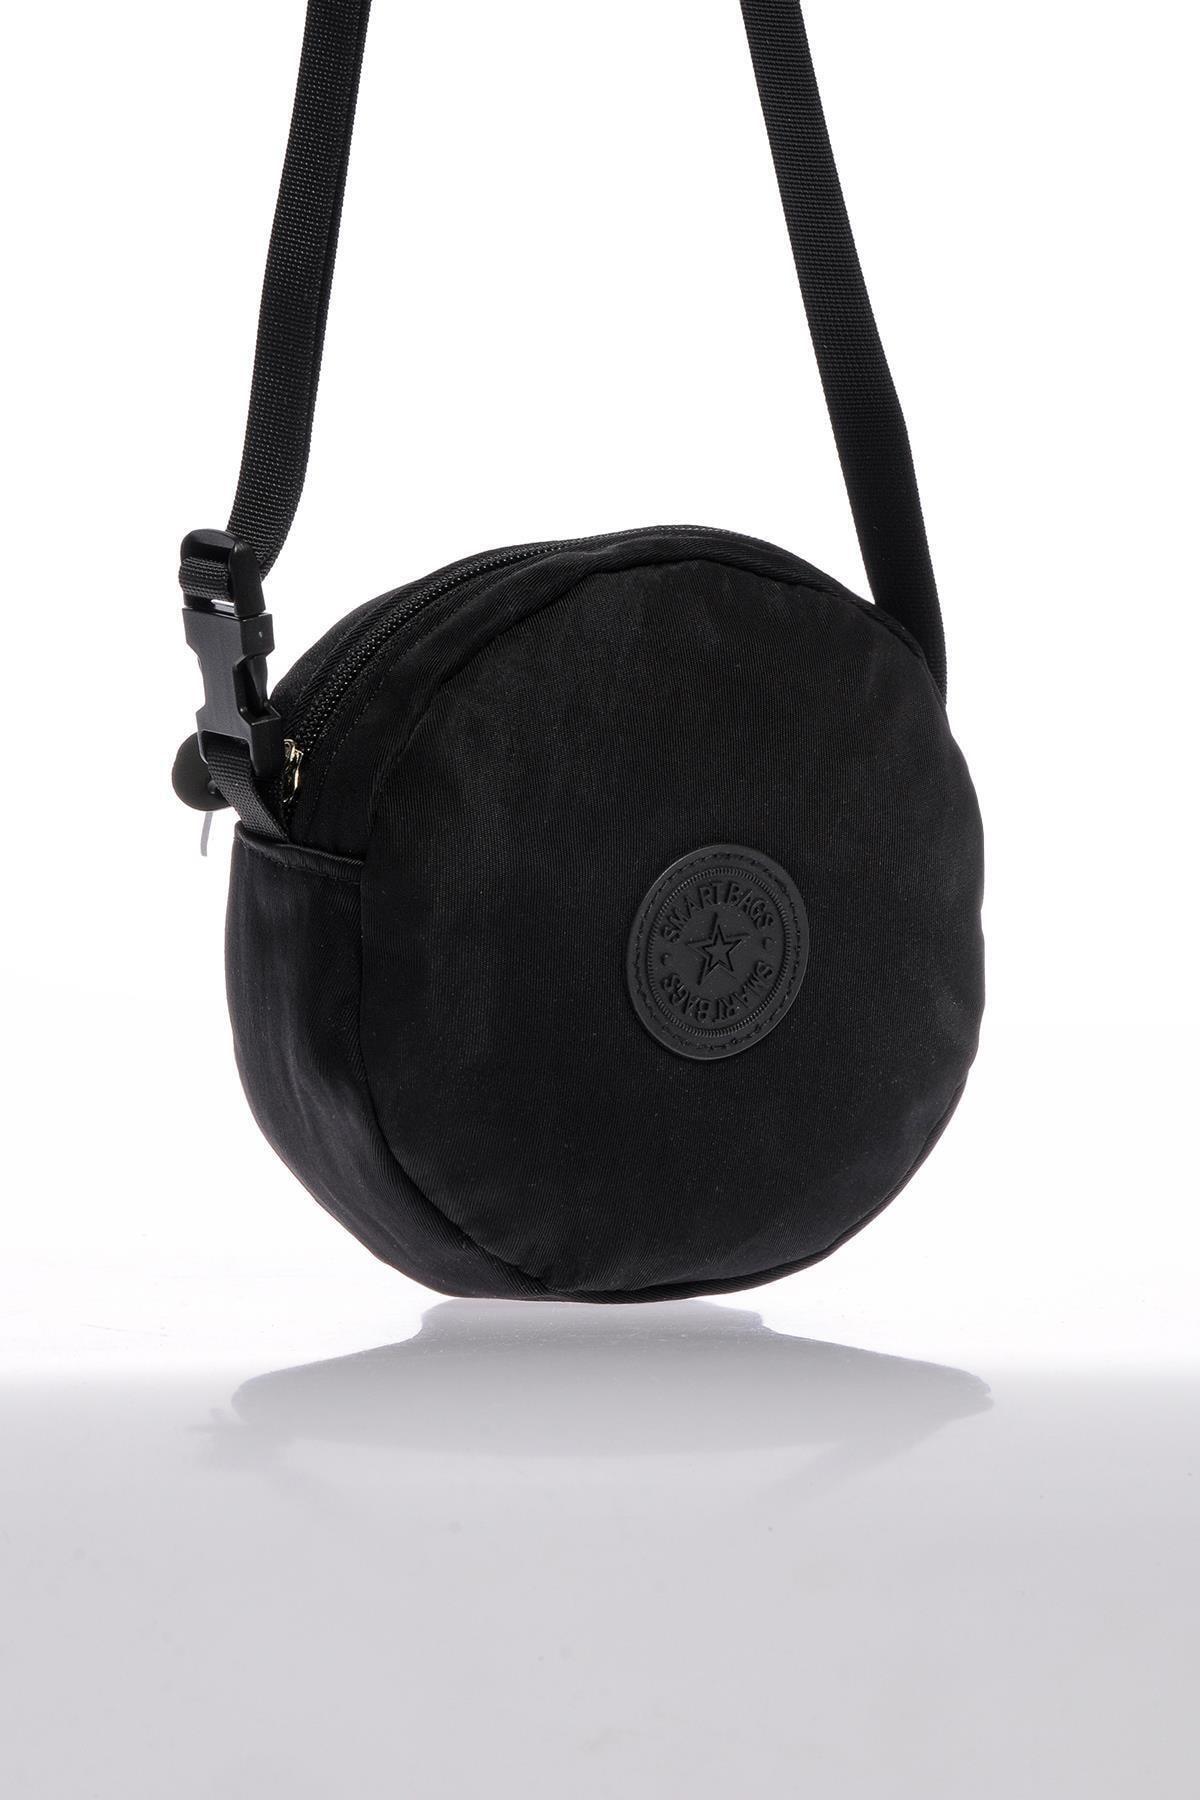 SMART BAGS Smb6001-0001 Siyah Kadın Minik Çapraz Çanta 2